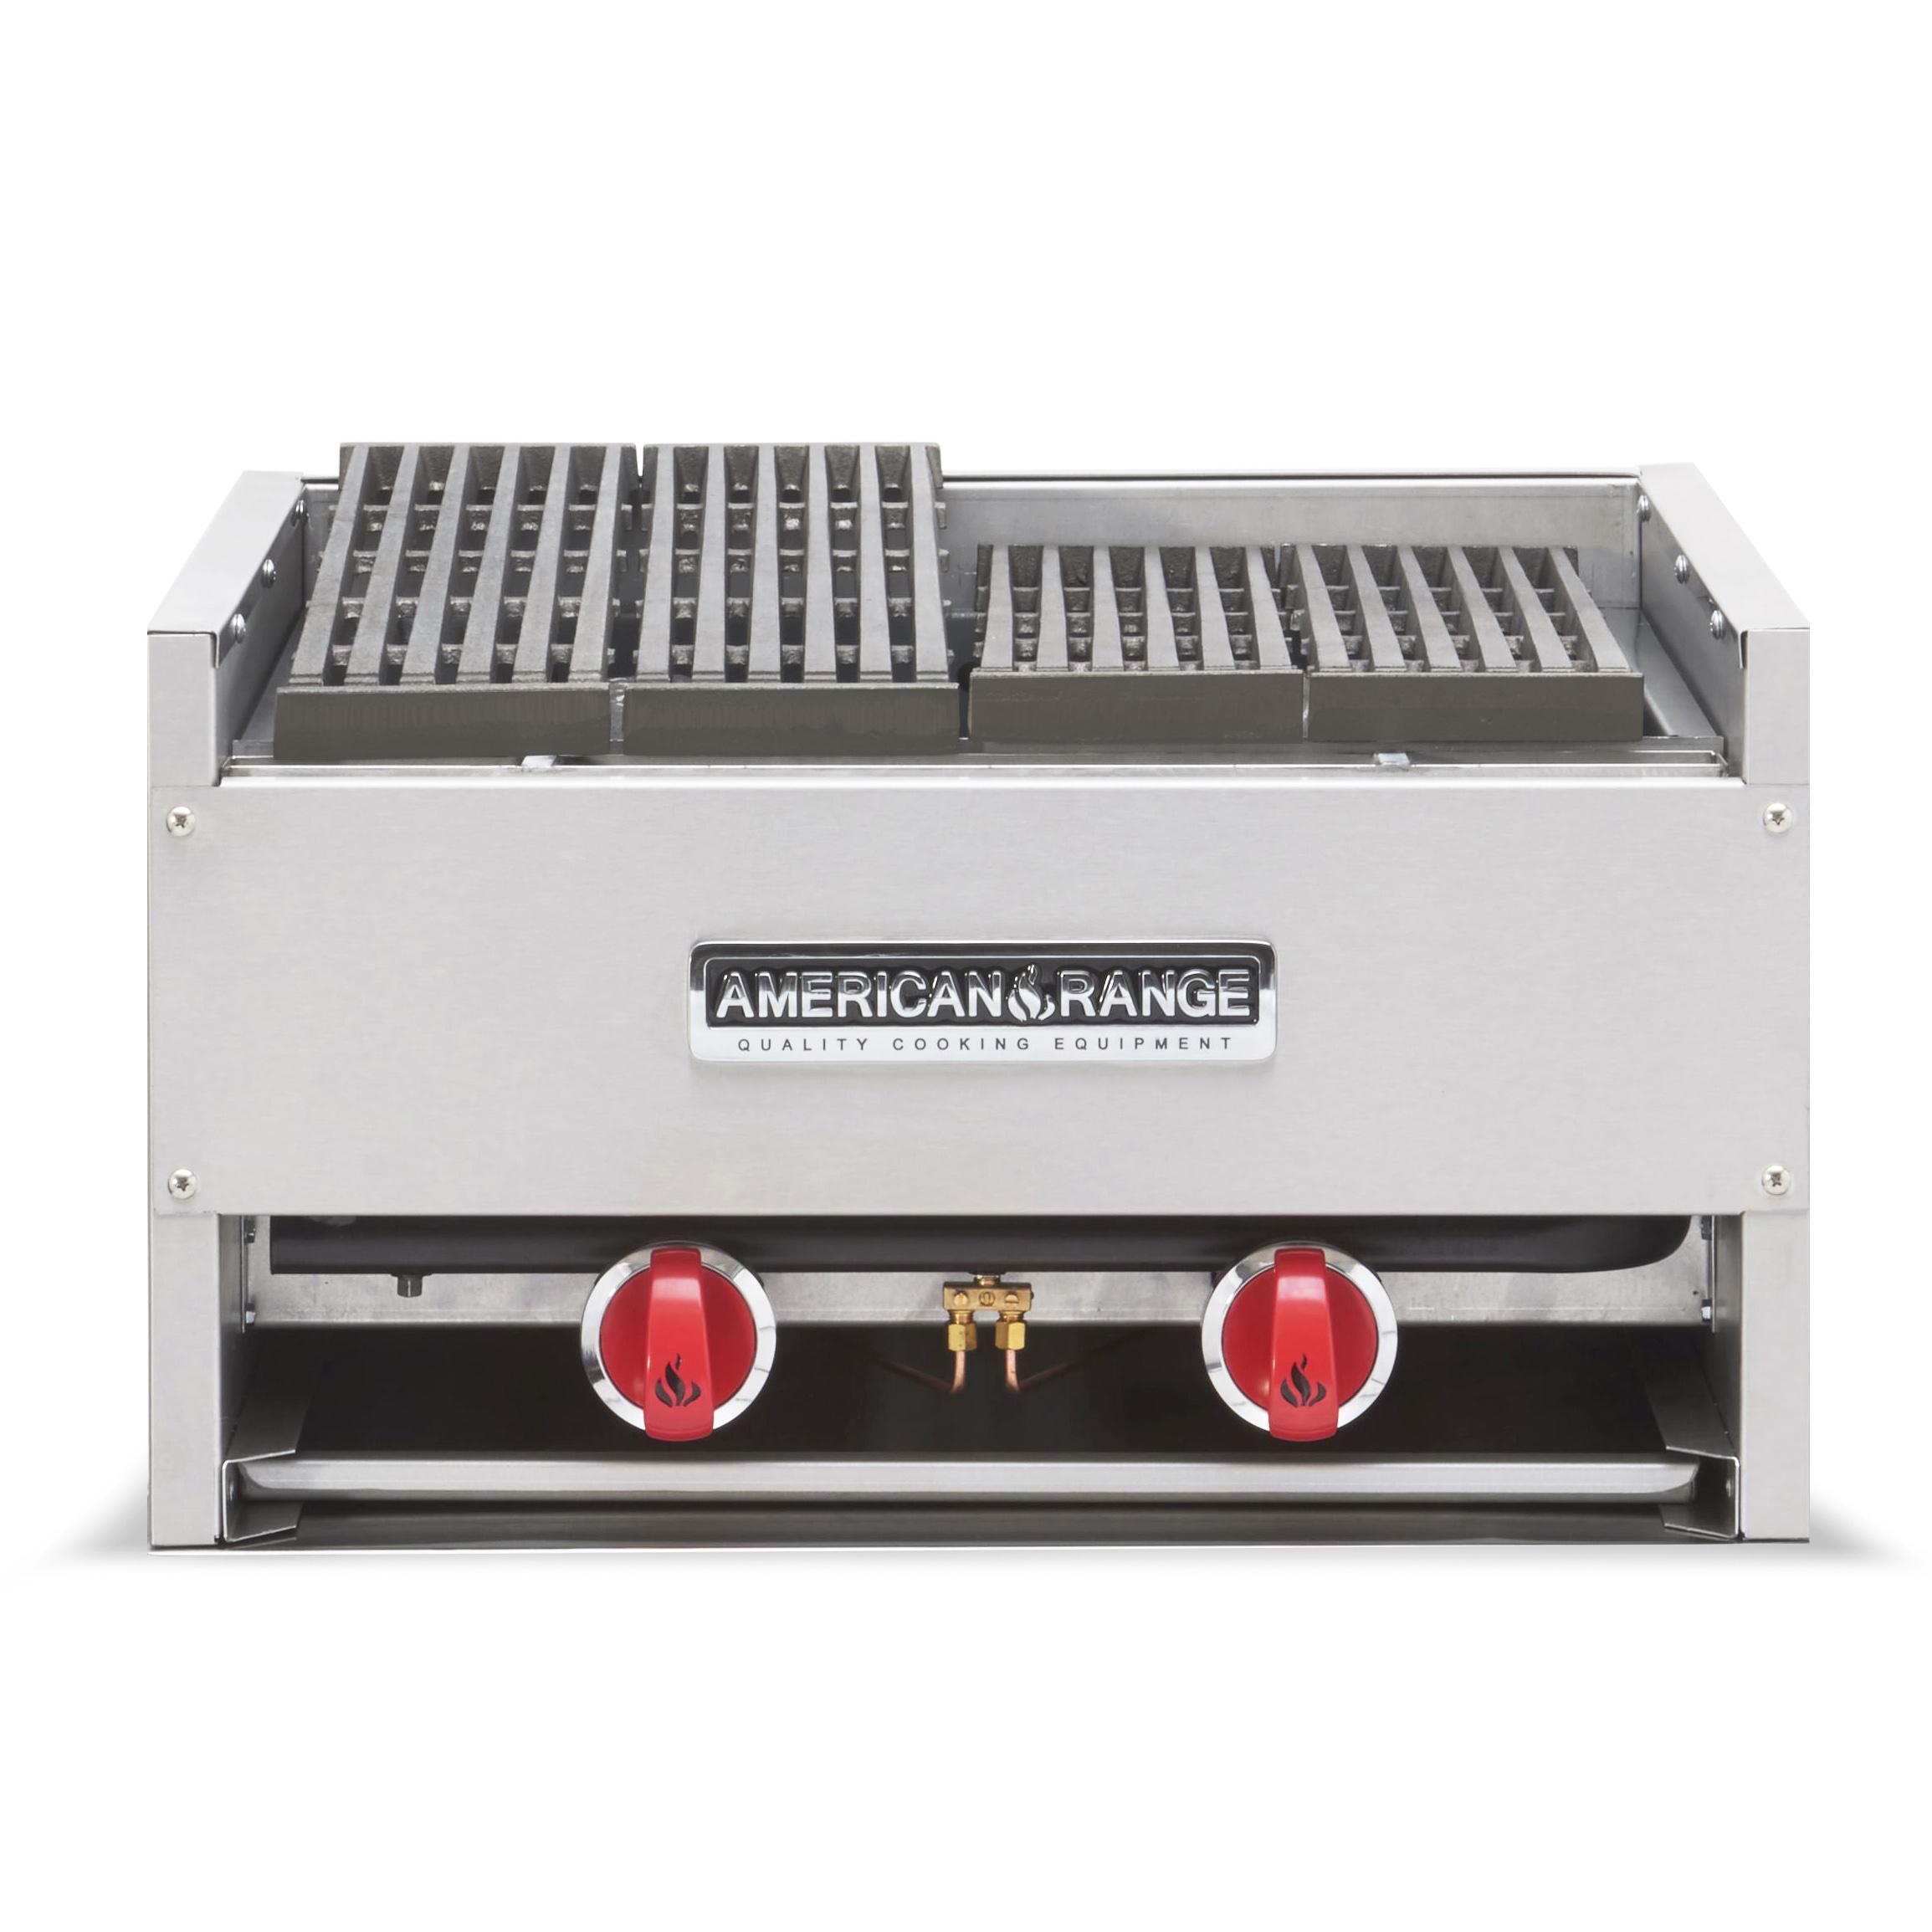 American Range AECB-74 charbroiler, gas, countertop